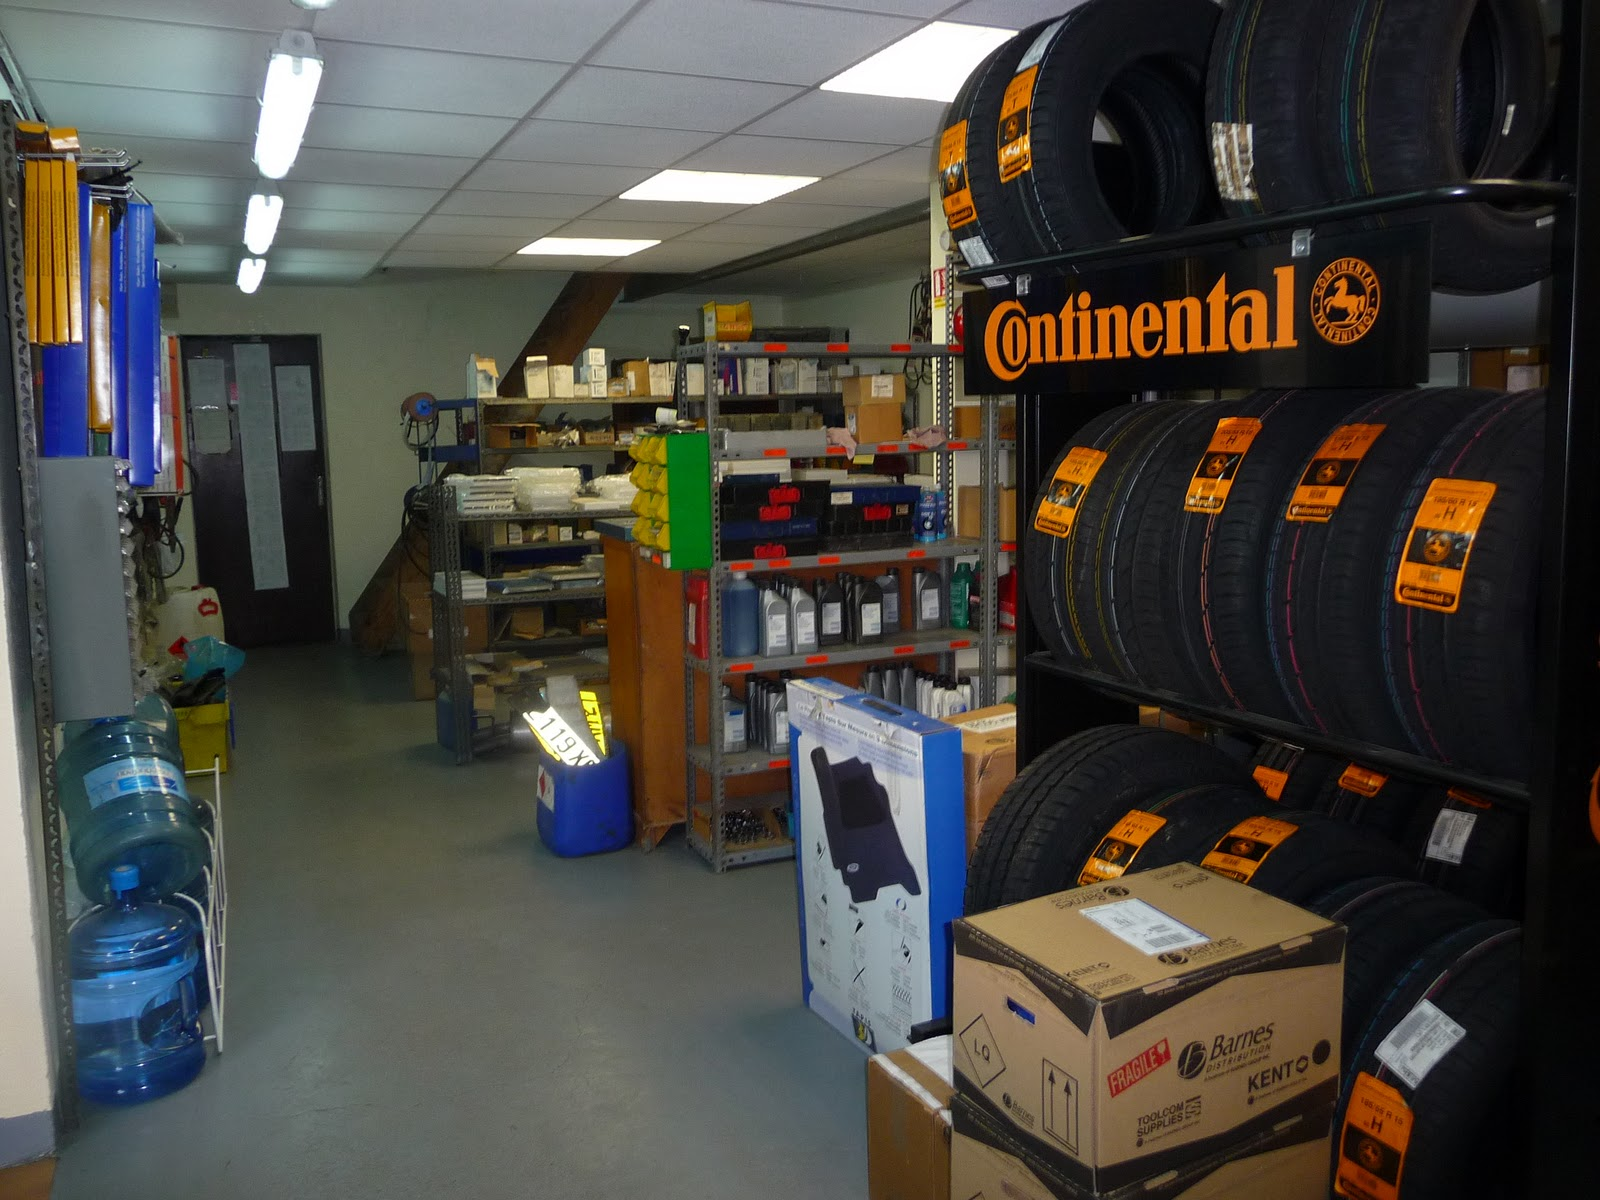 Garage fond de commerce a vendre agent opel 95 - Commerce garage a vendre ...